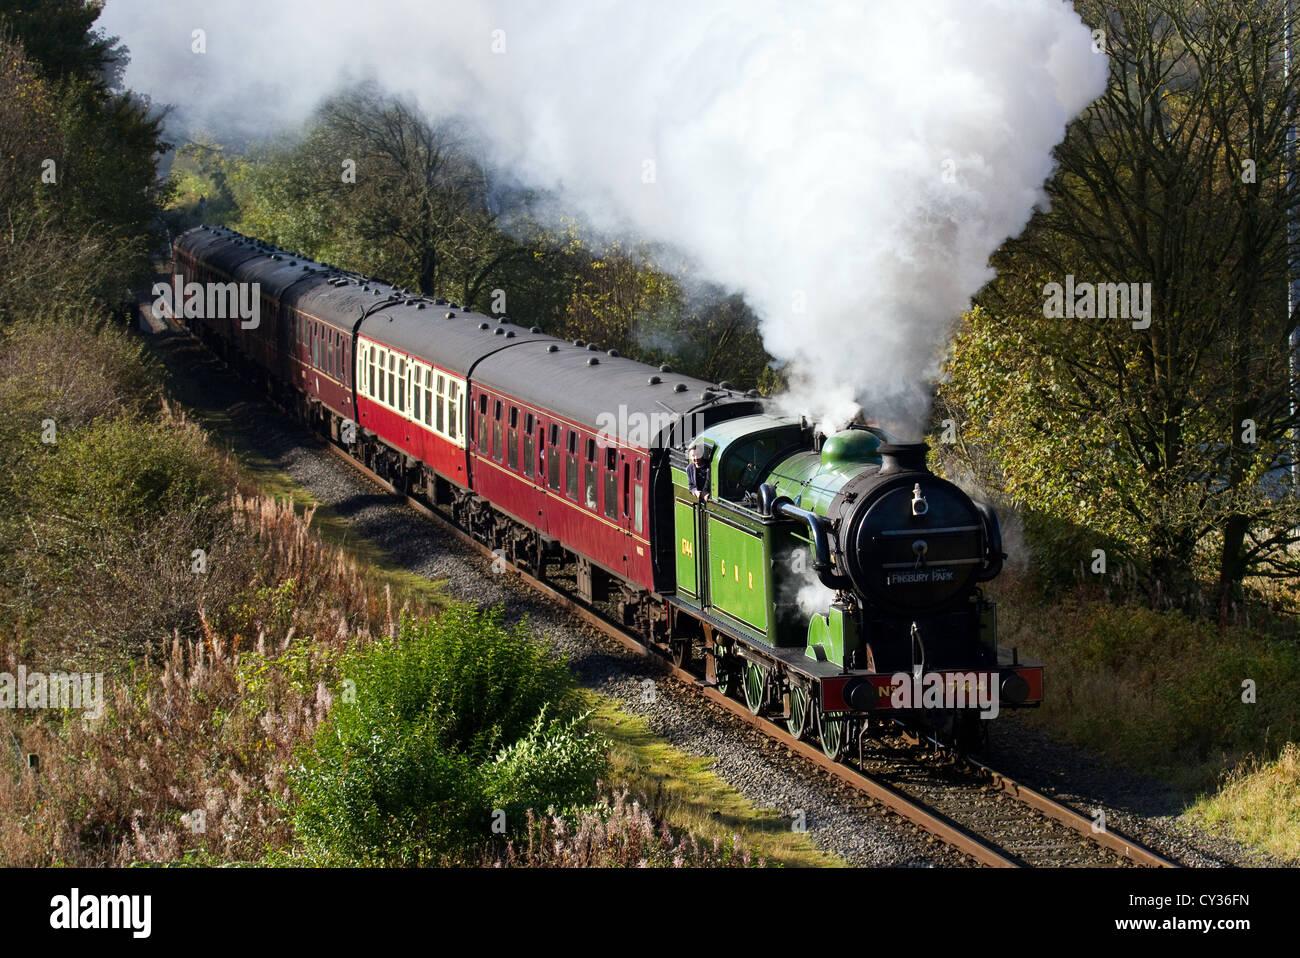 61306 British Railways 'Mayflower' 1940s LNER Thompson-class B1 restored engine, running at speed at heritage steam Stock Photo